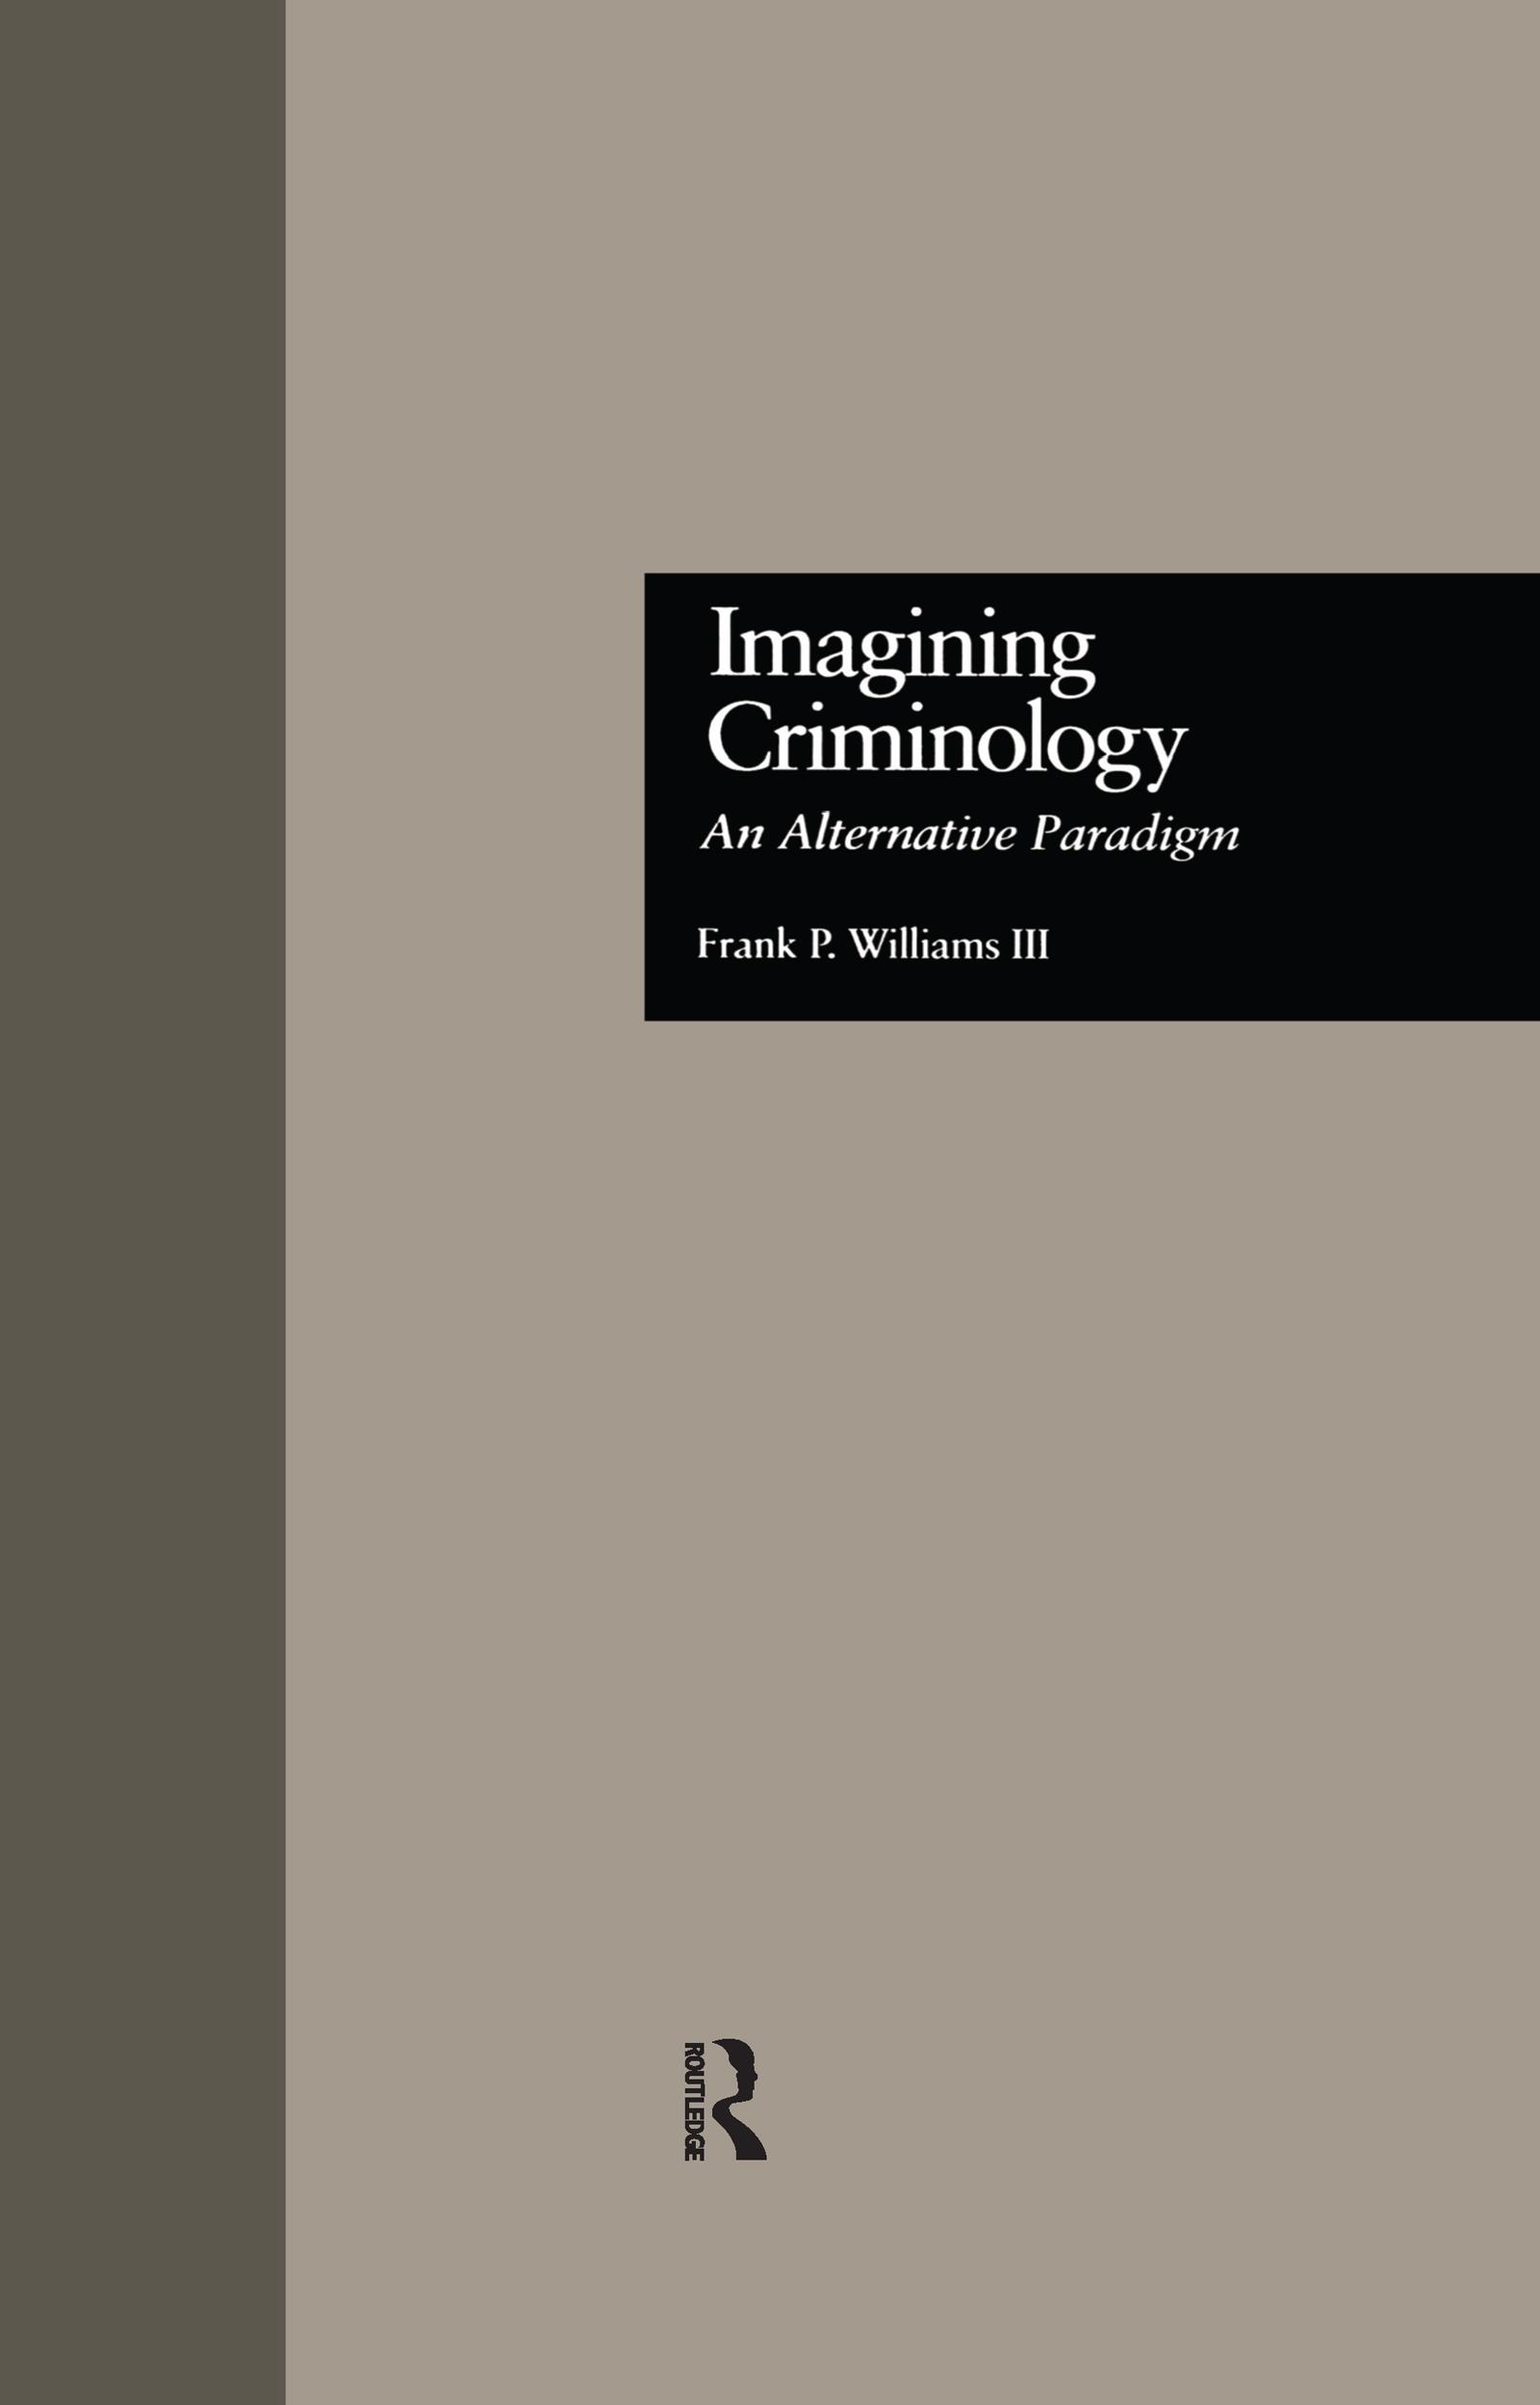 Imagining Criminology: An Alternative Paradigm book cover